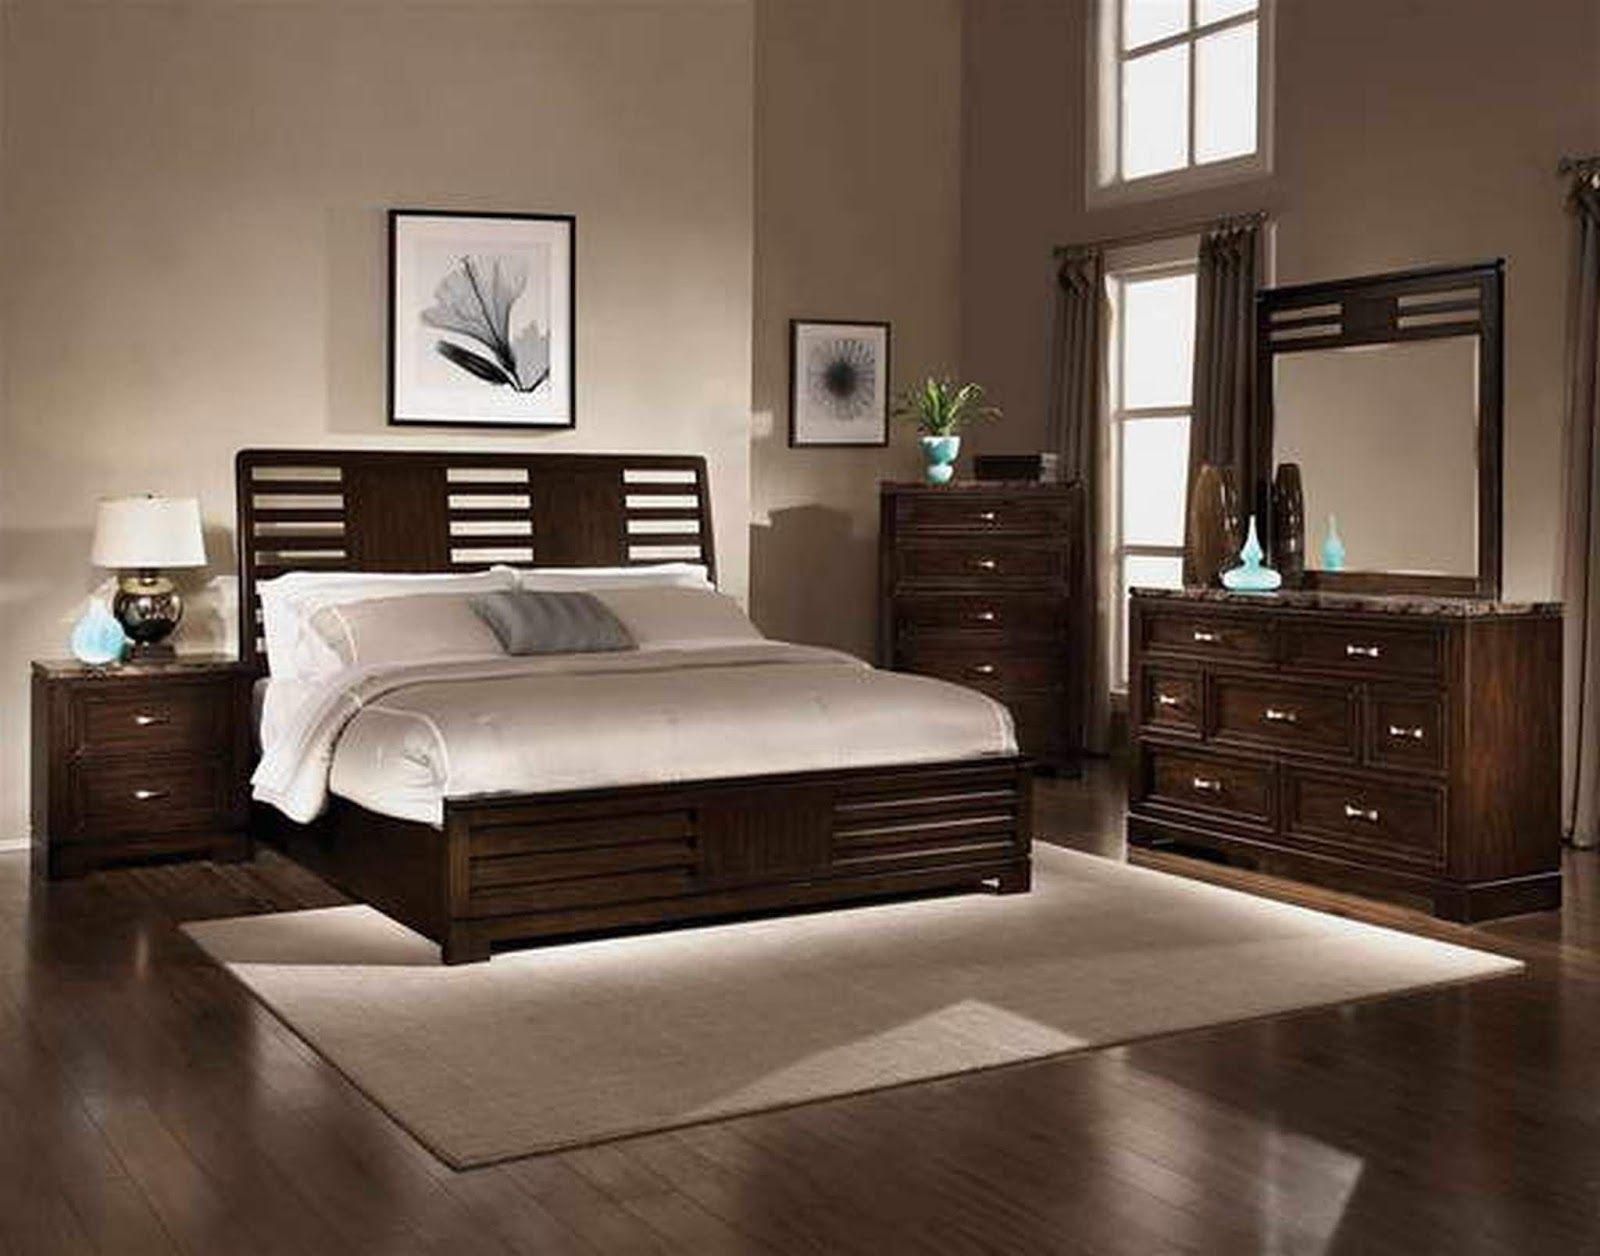 Bedroom Ideas Dark Furniture Ashley Bedroom Furniture Sets Bedroom Furniture Sets Espresso Bedroom Furniture